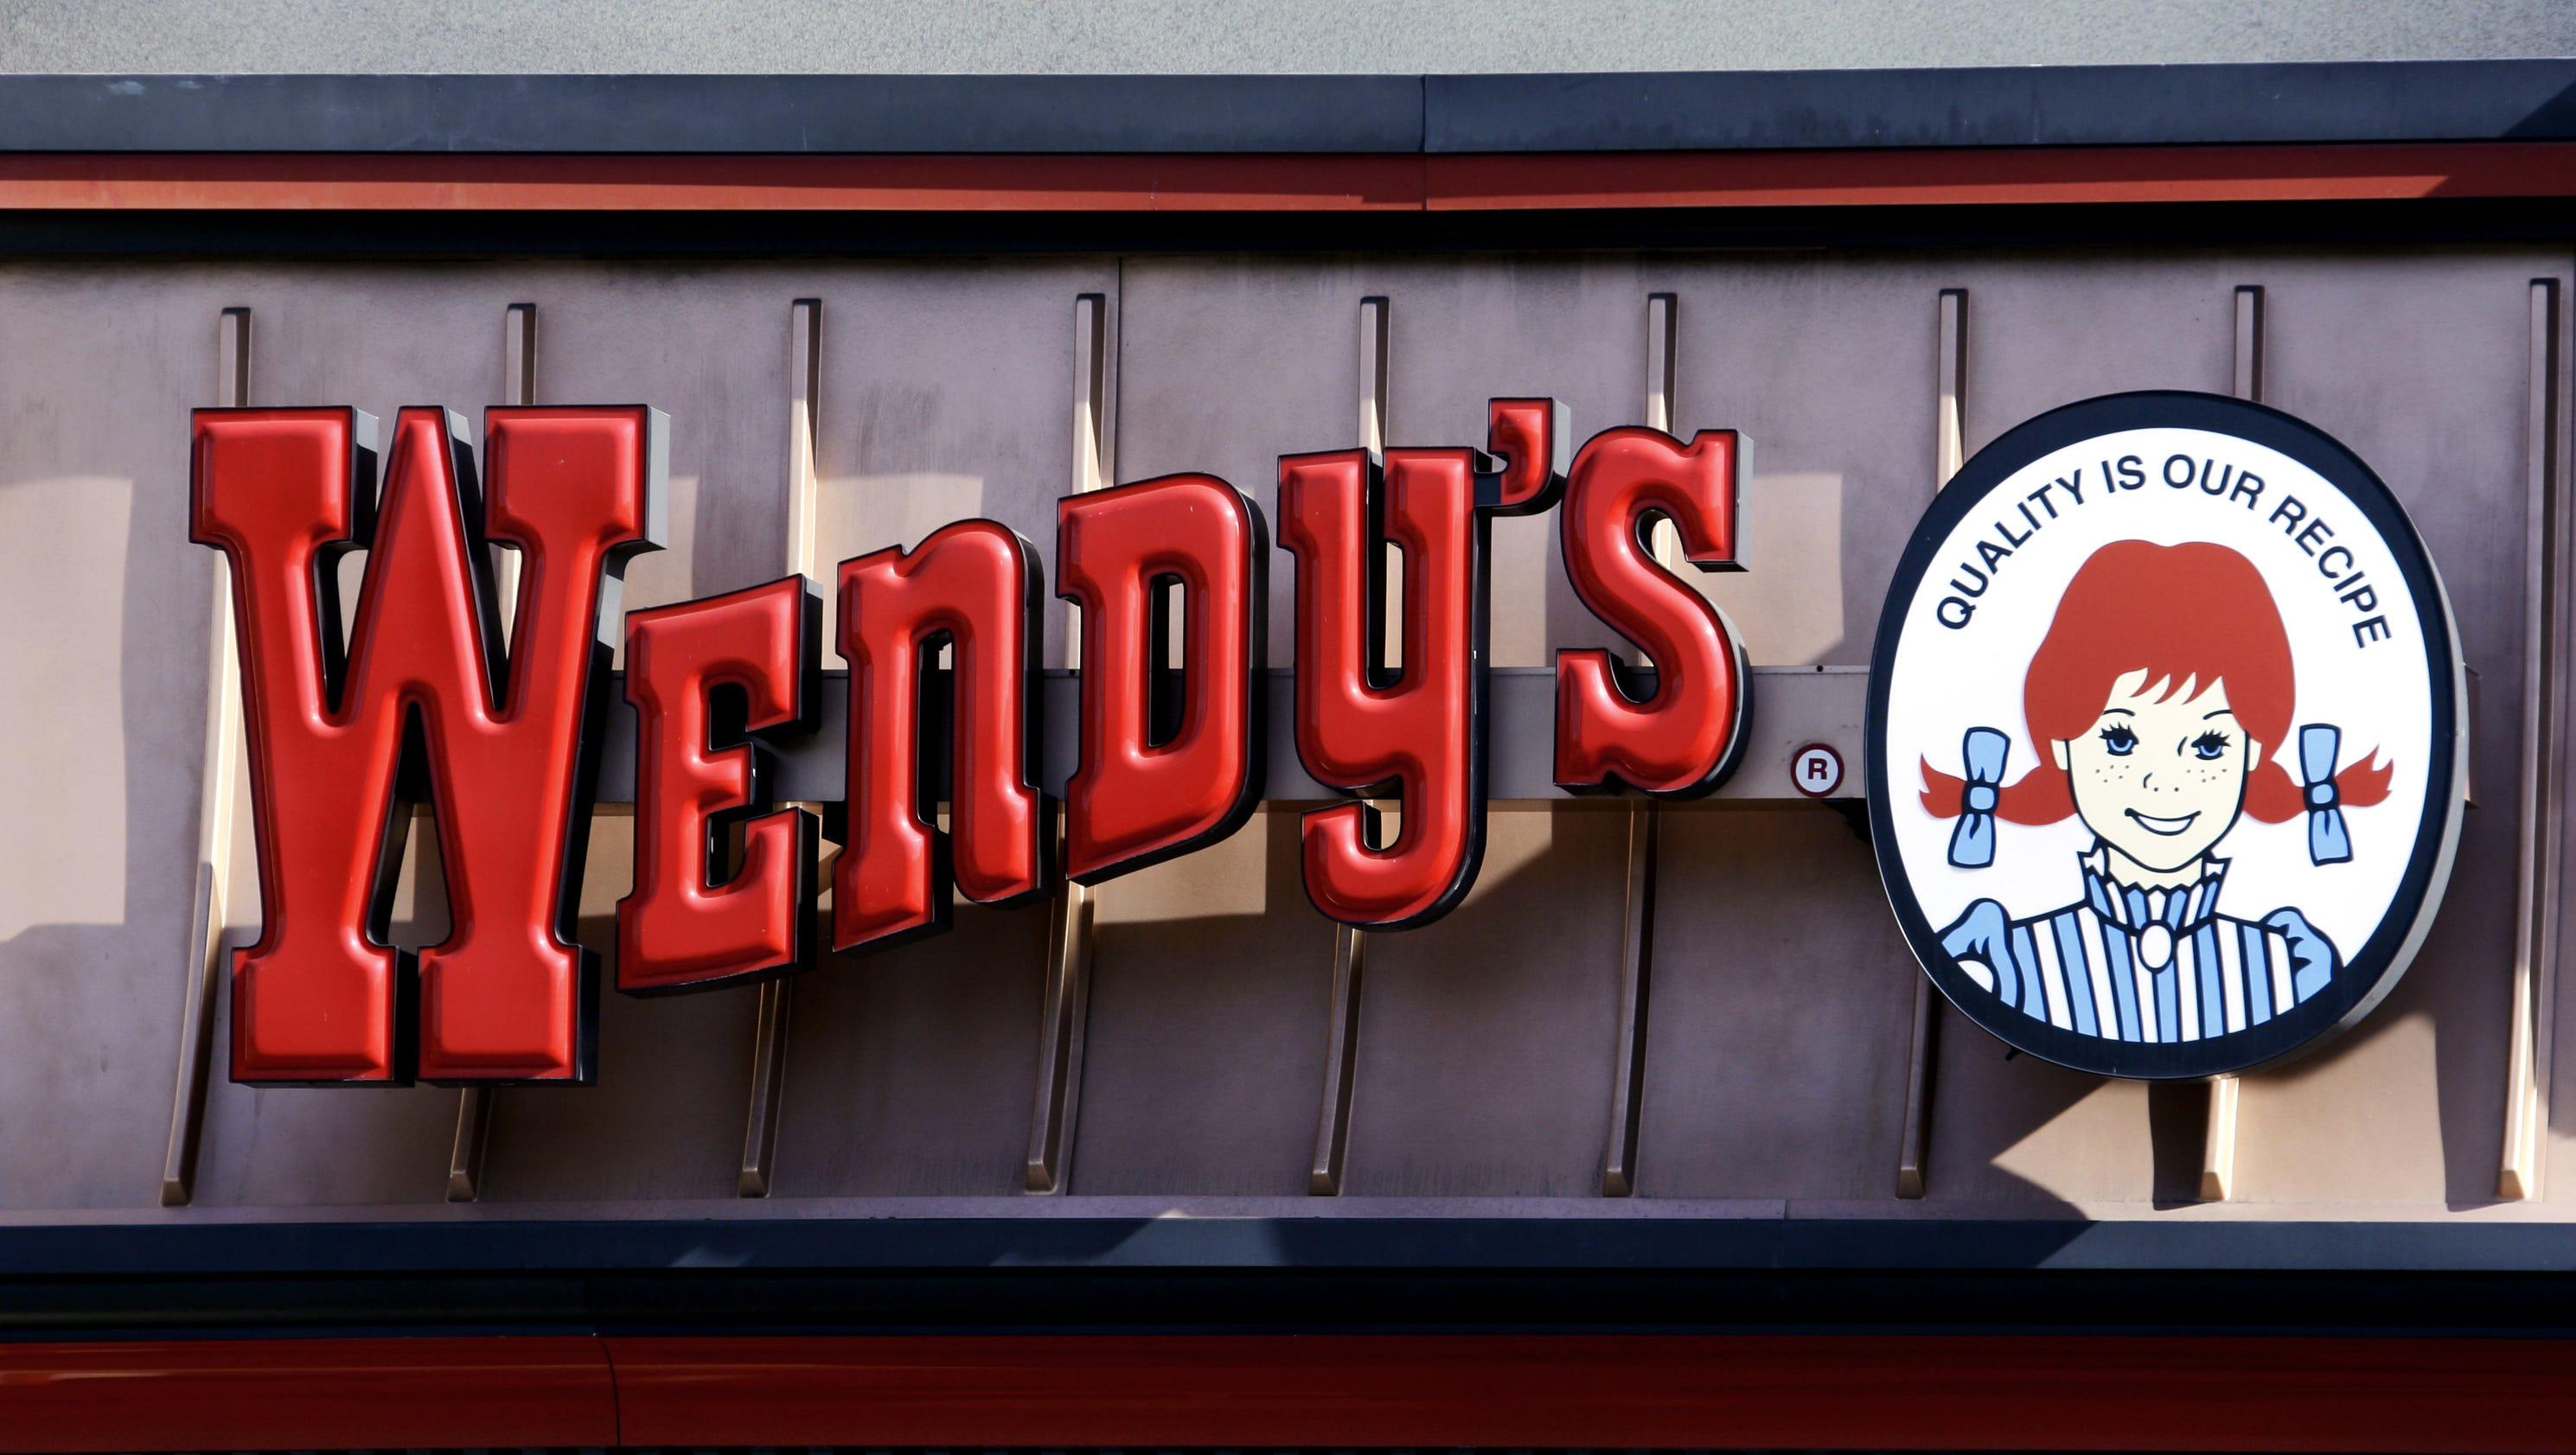 Wendy's: Customers of Springfield, Nixa restaurants may have had payment card info stolen